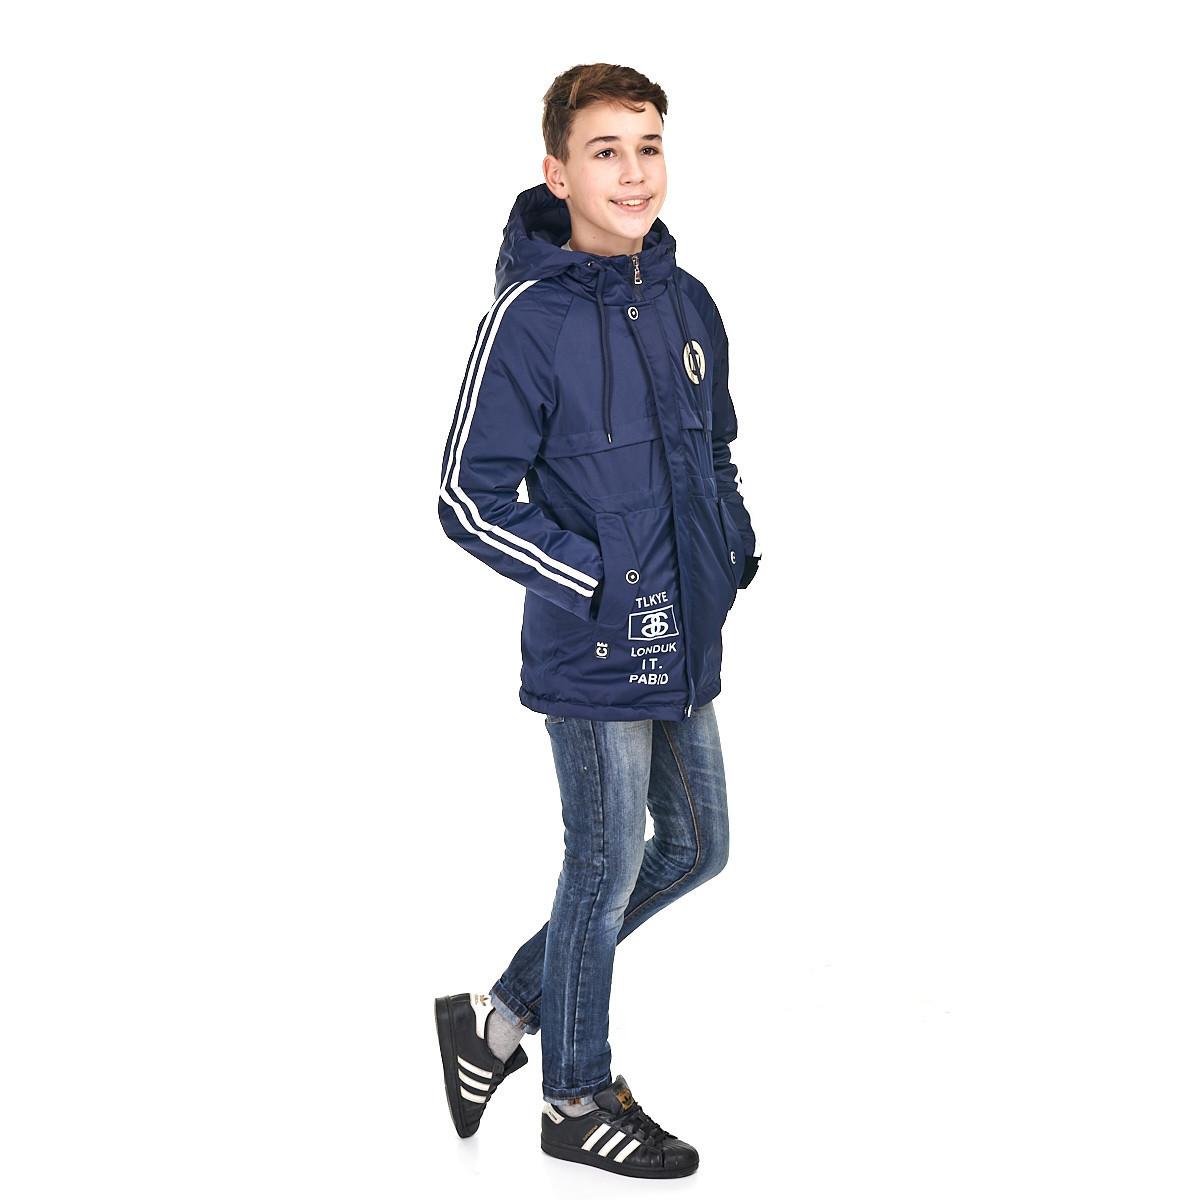 Осенняя куртка на мальчика от 9 до 14 лет от Maz Juang, темно-синий цвет